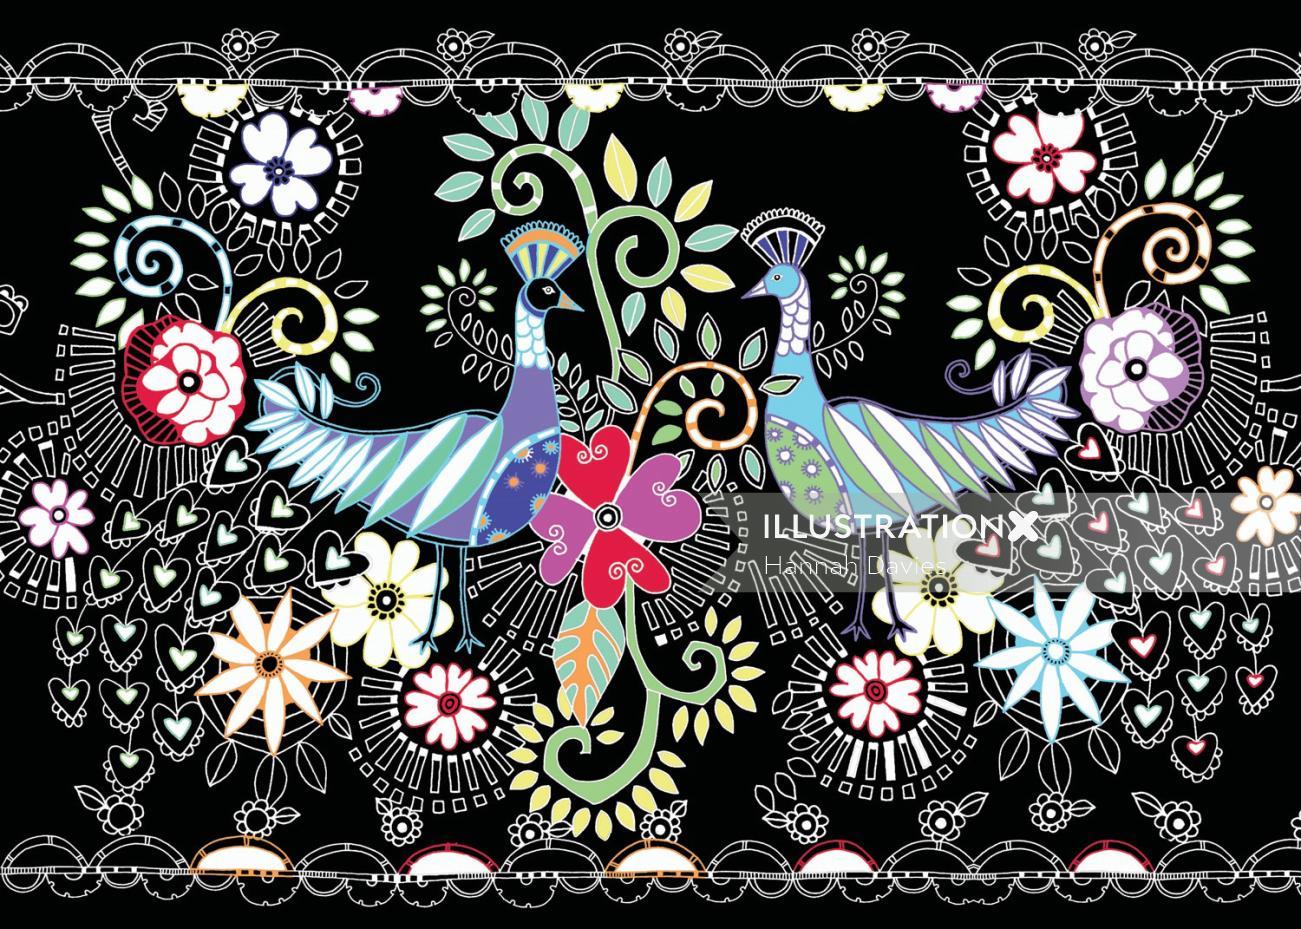 Peacock illustration by Hannah Davies